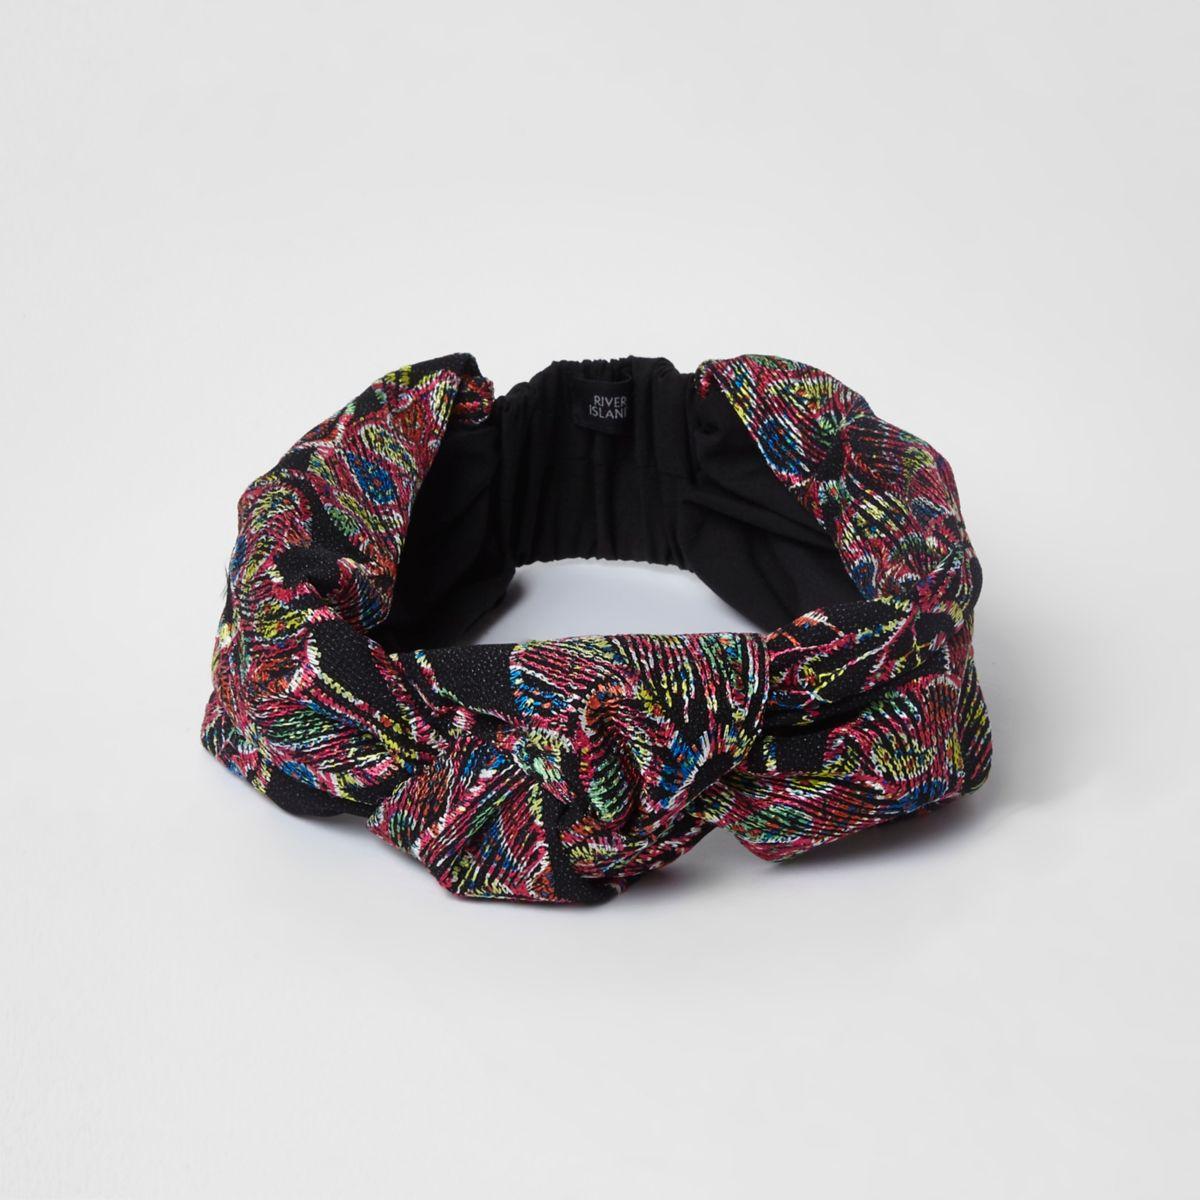 Black embroidered knot headband